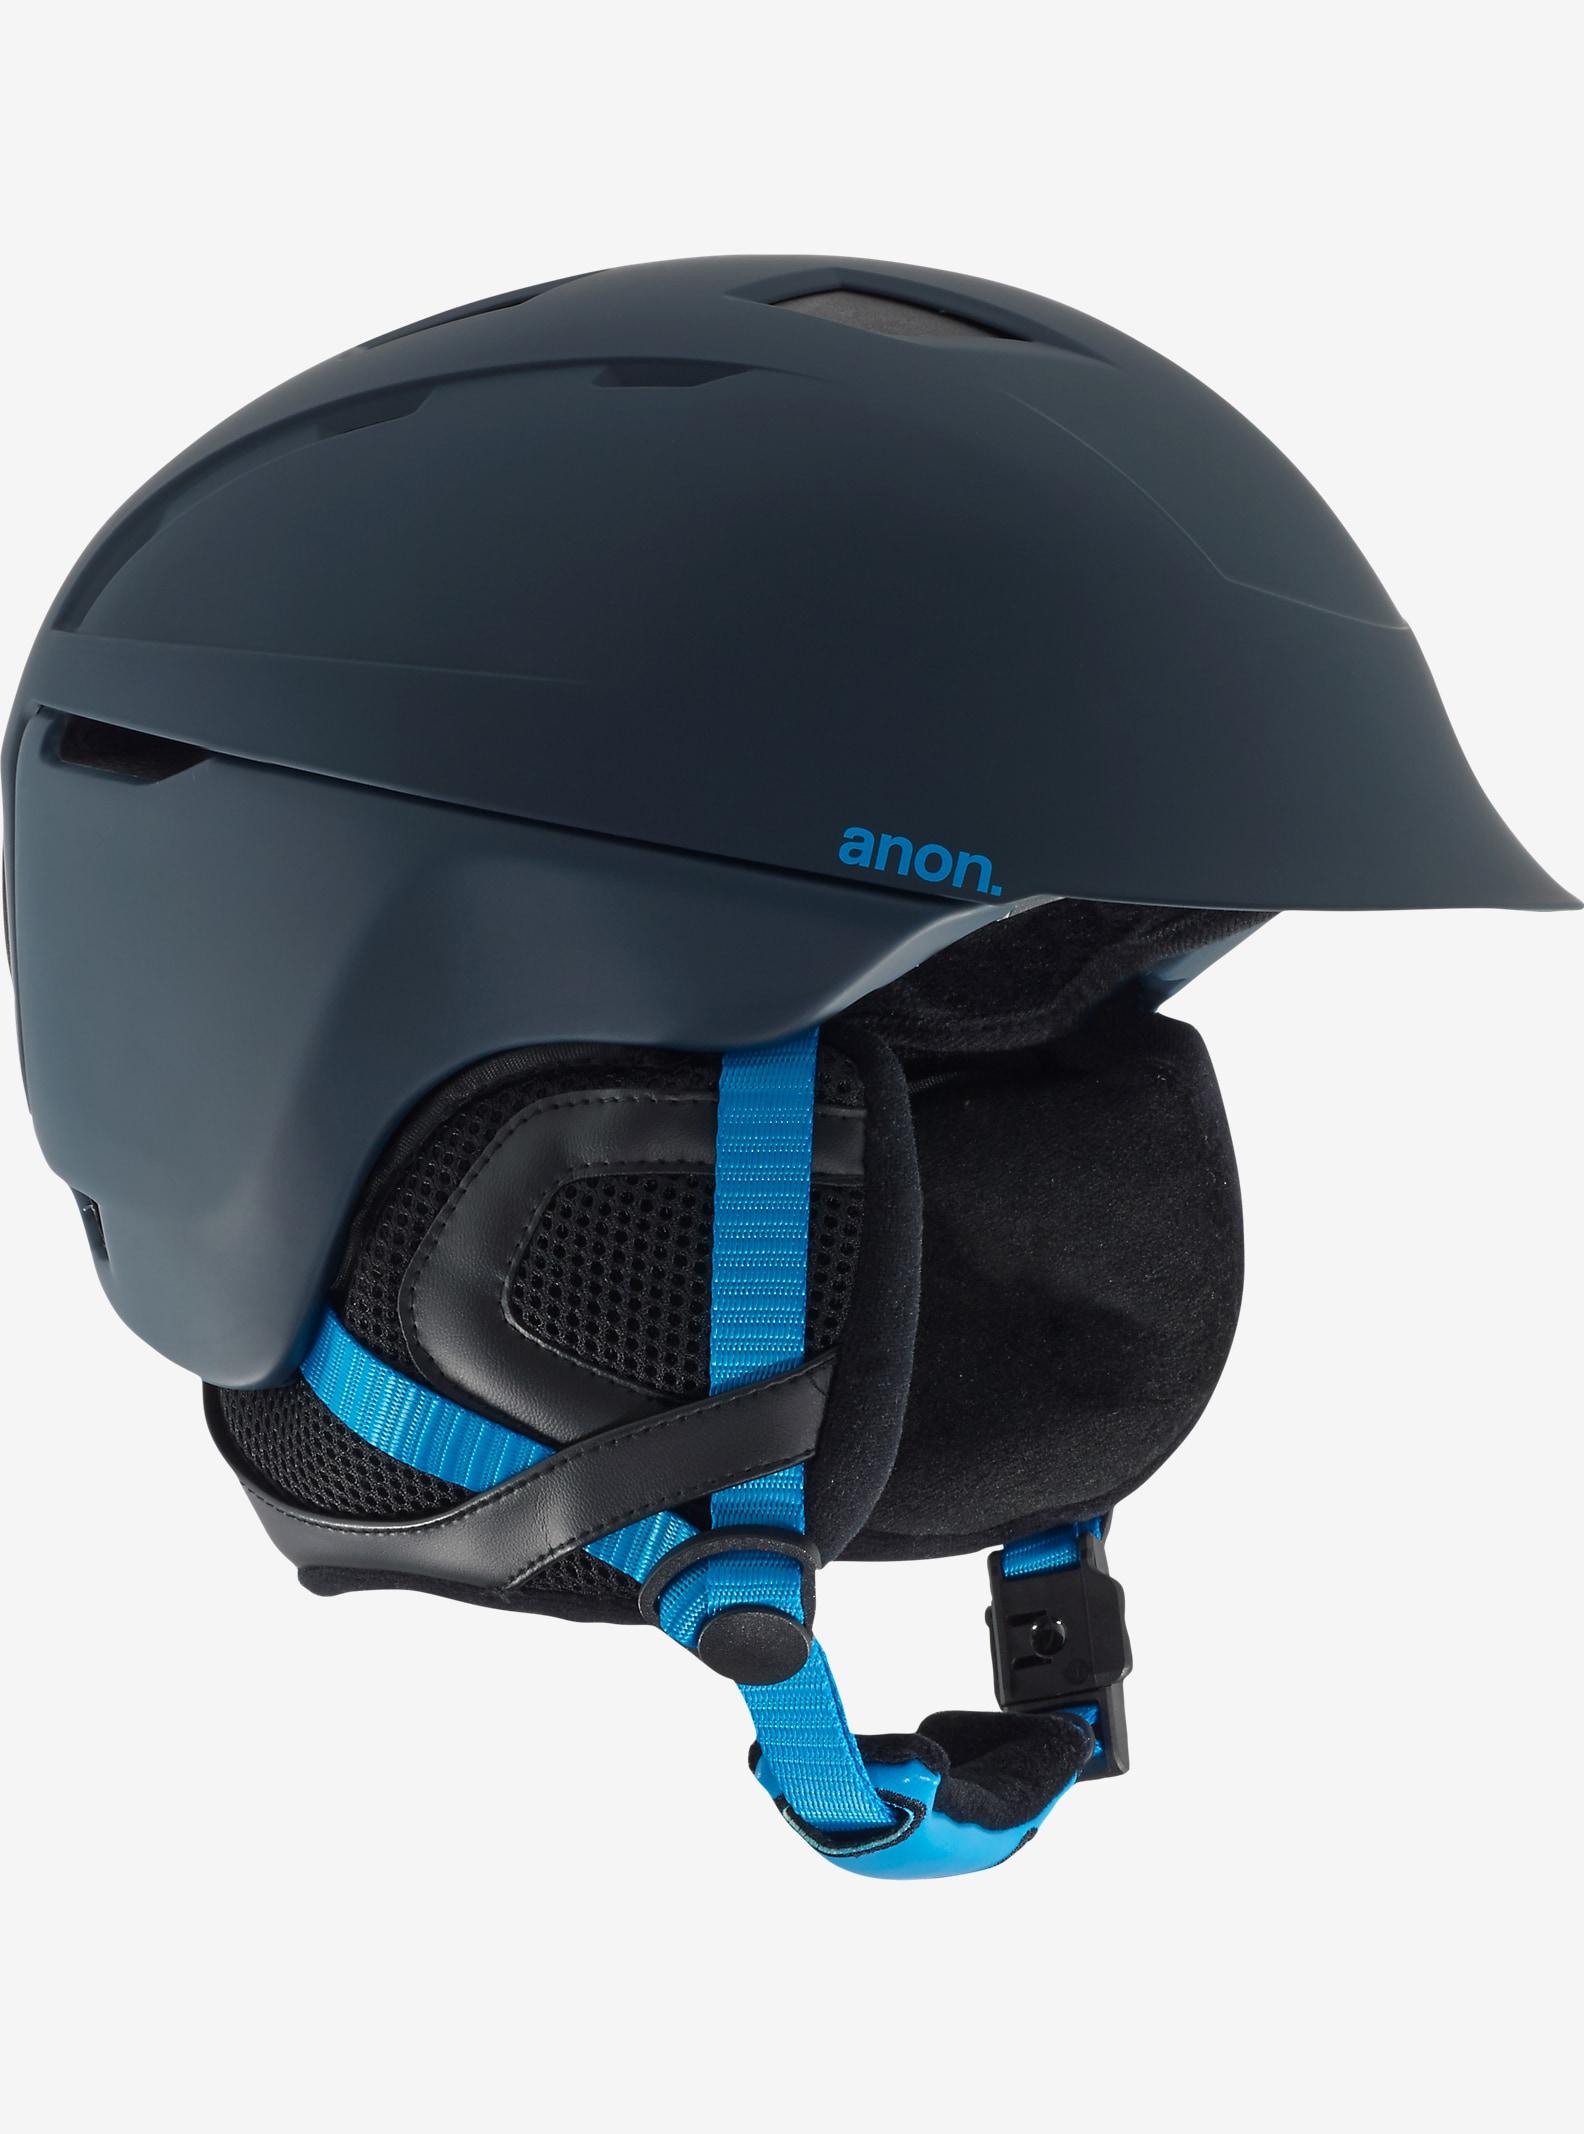 anon. Thompson Helmet shown in Midnight Blue